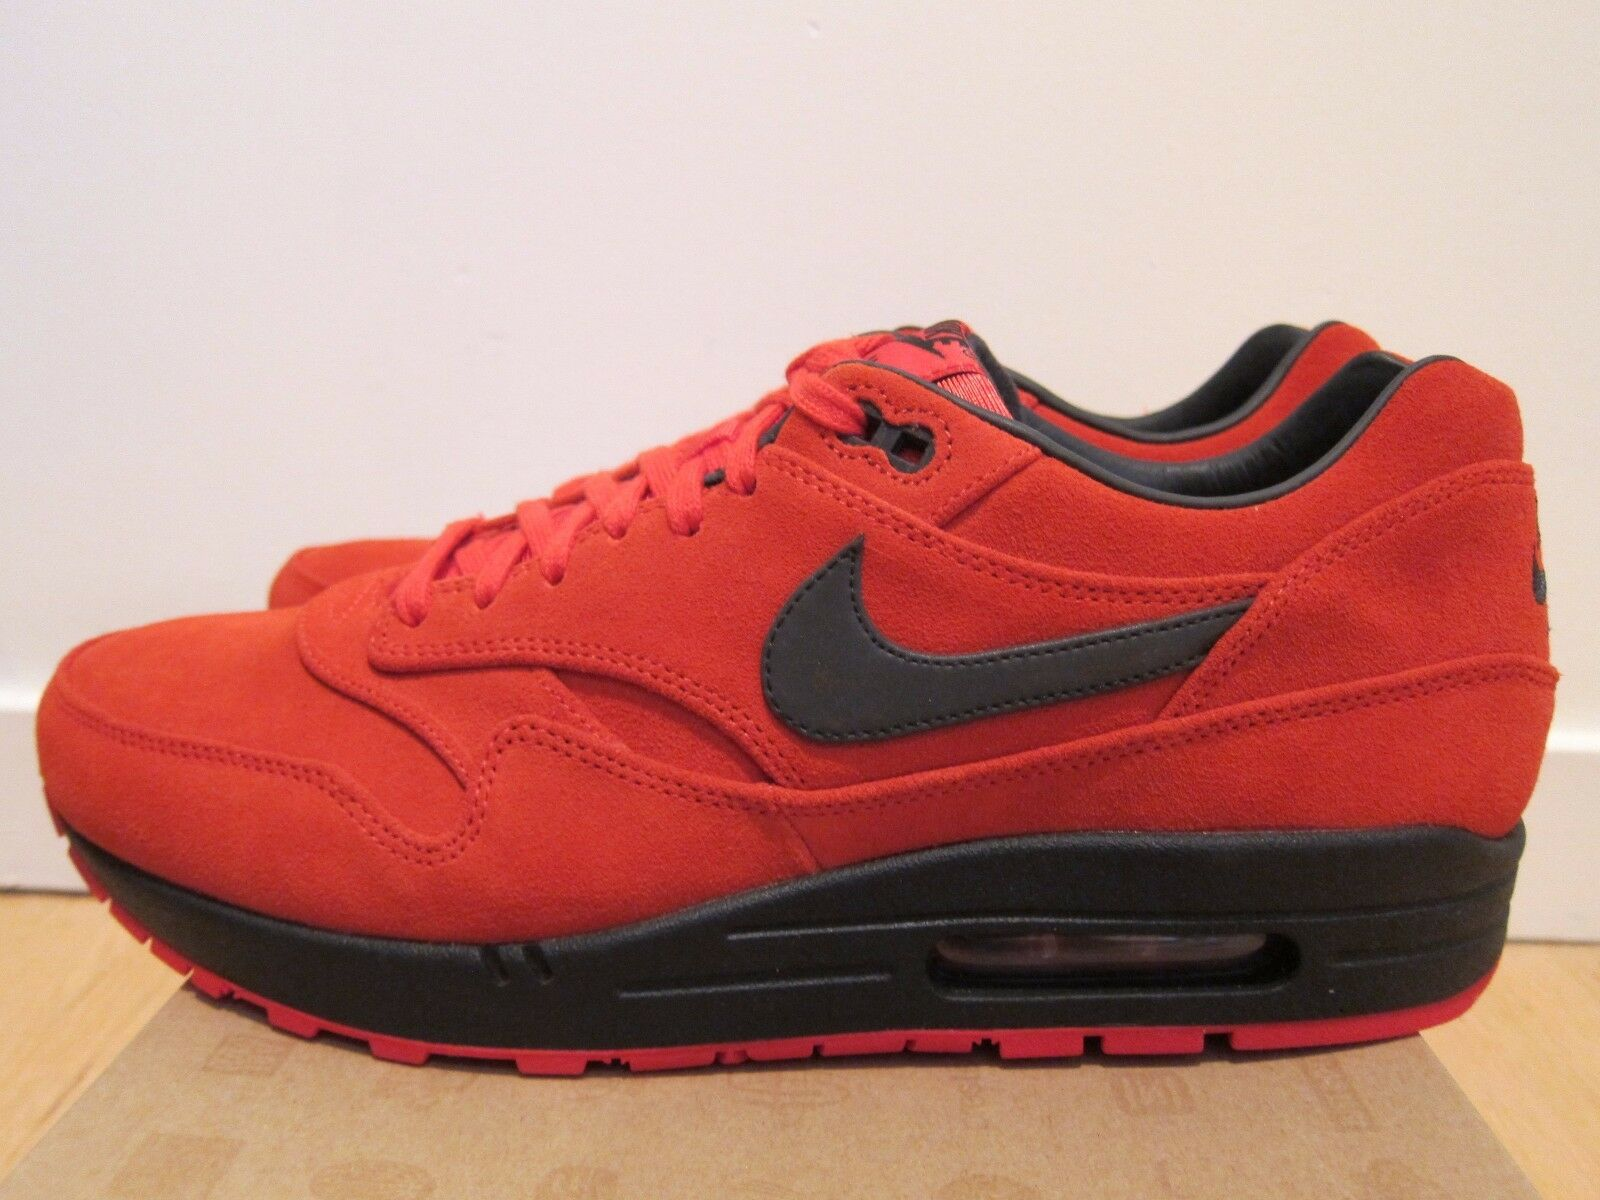 the latest 5db24 489ee 2012 Nike Air Max 1 PRM Premium Pimento Red Black 3M sizes 10-14 free